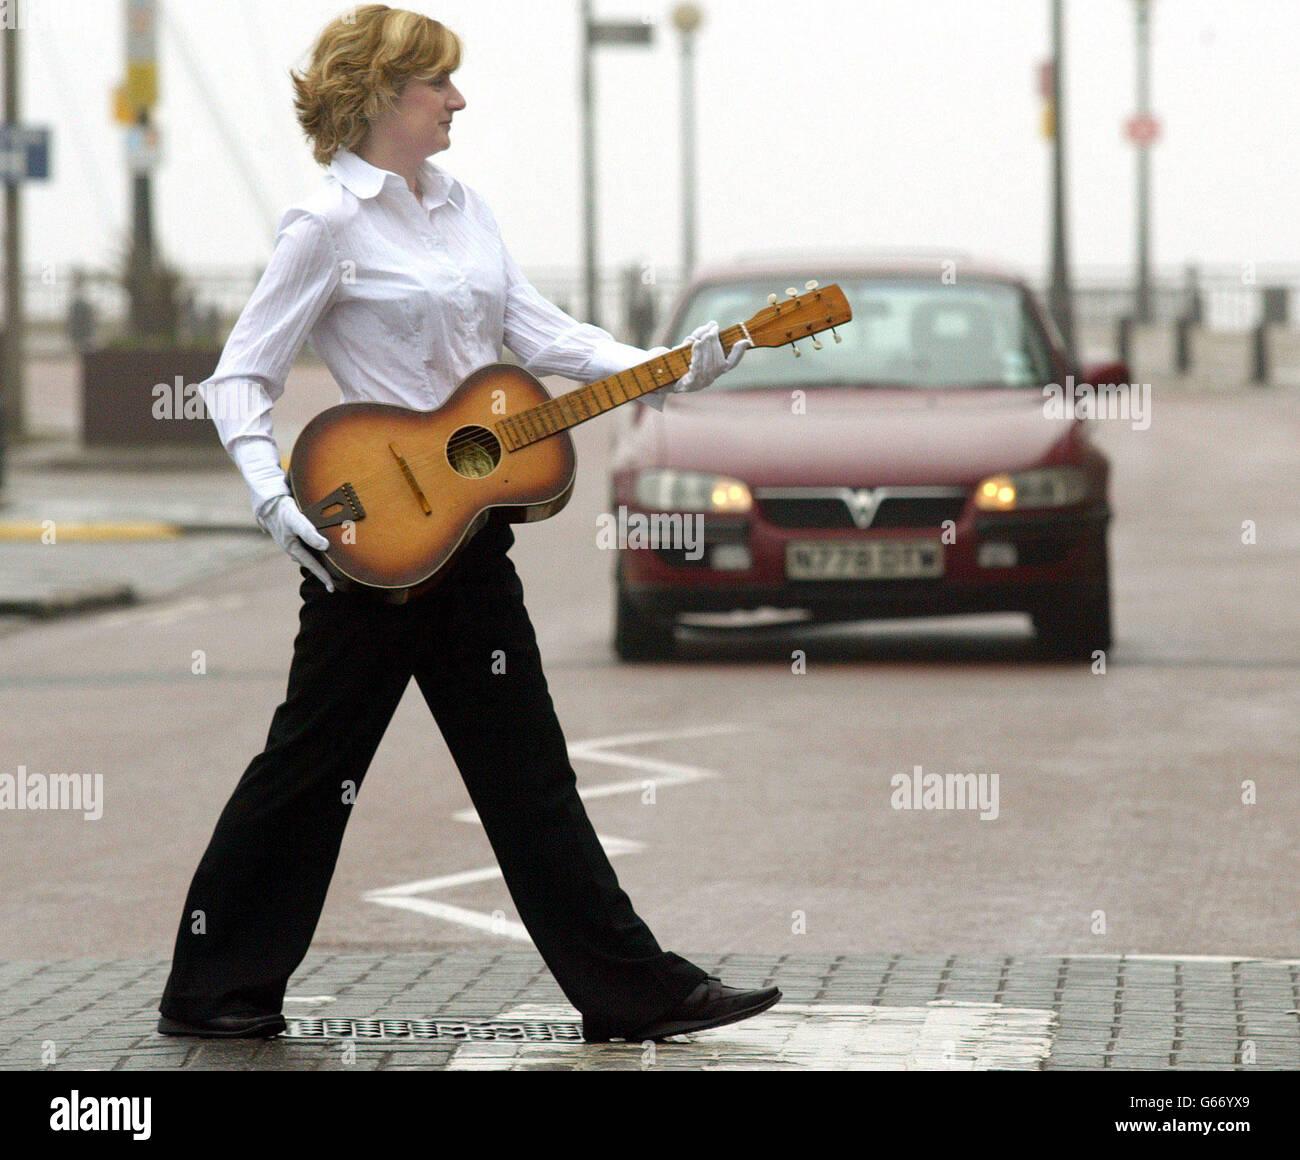 George Harrison - Egmond guitar - Stock Image